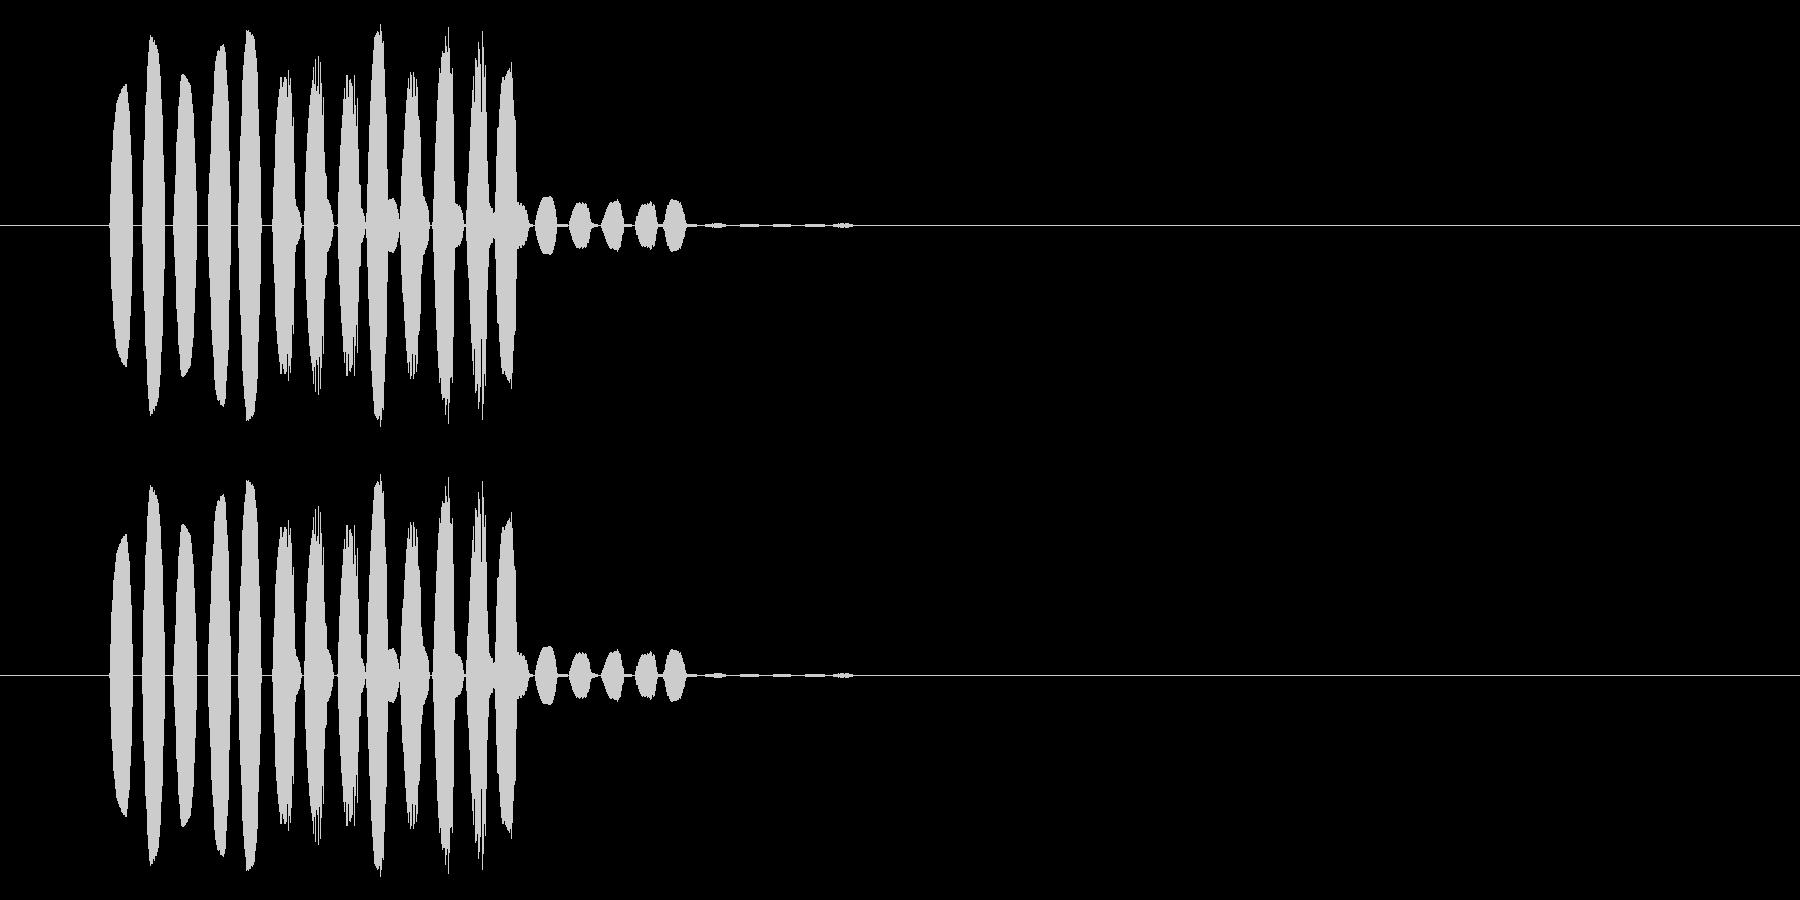 SNES-RPG04-14(魔法 状態)の未再生の波形